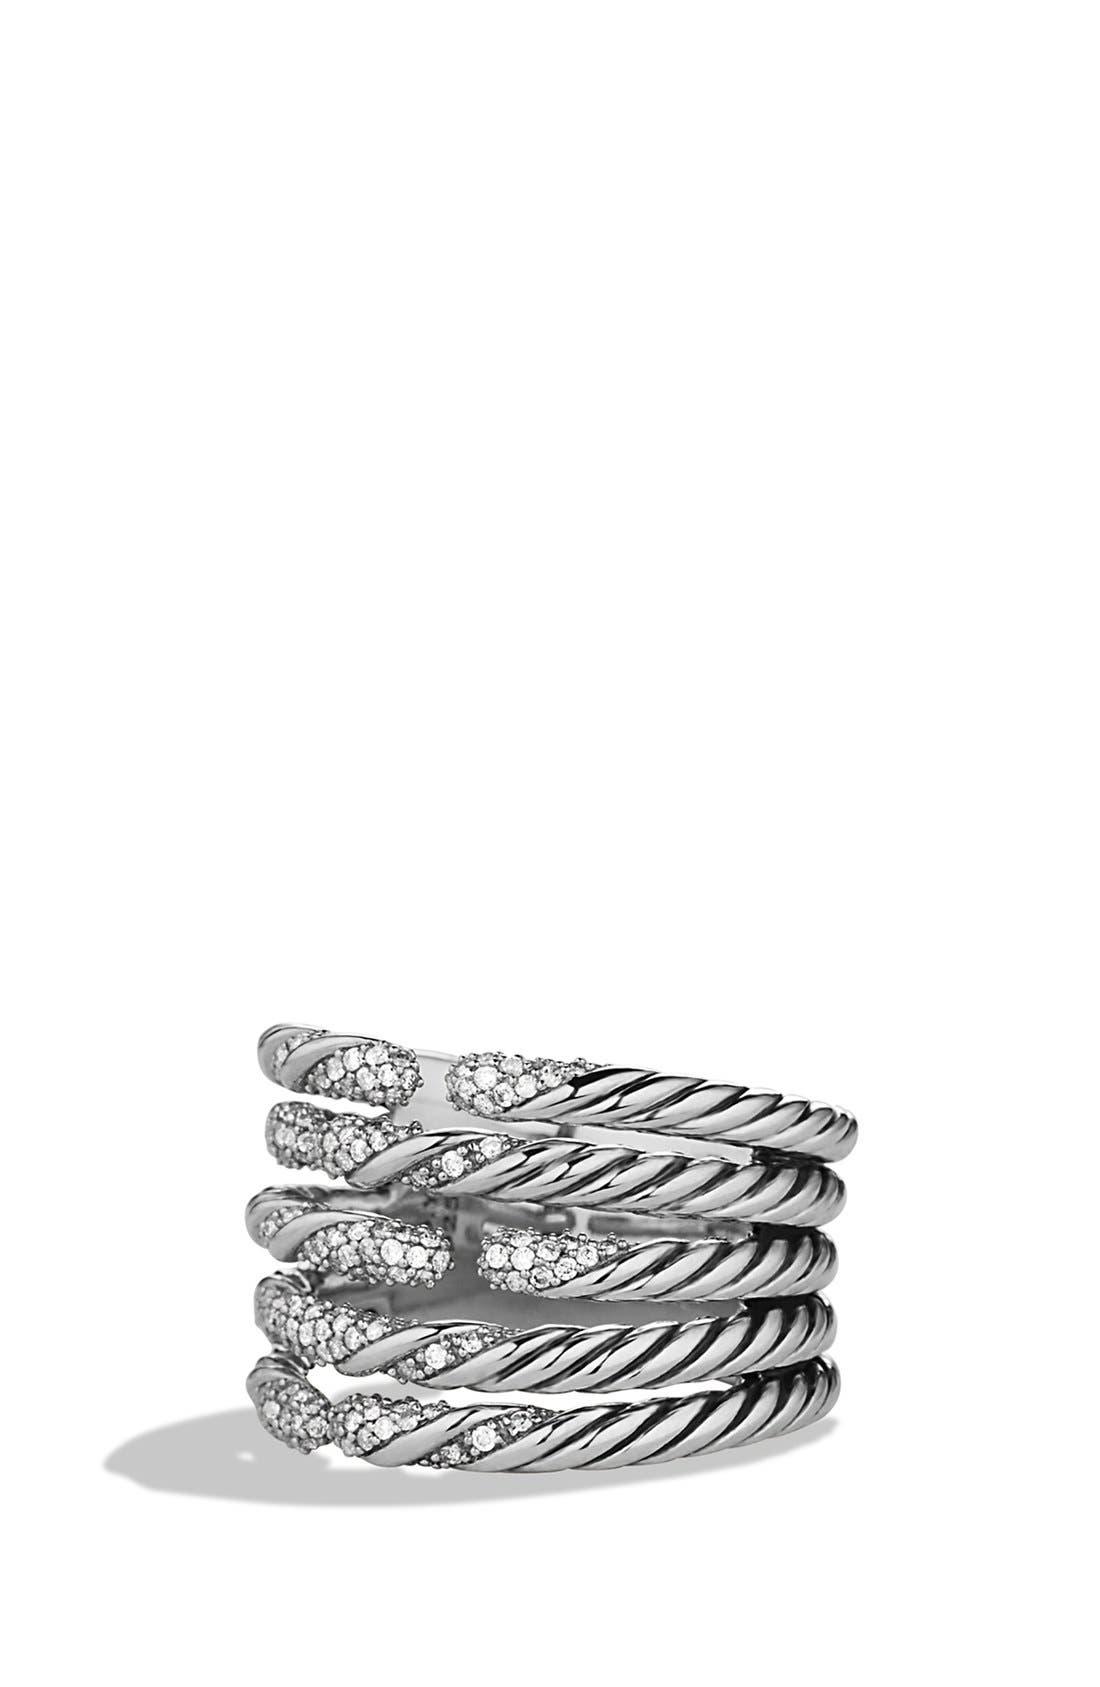 David Yurman 'Willow' Five-Row Ring with Diamonds